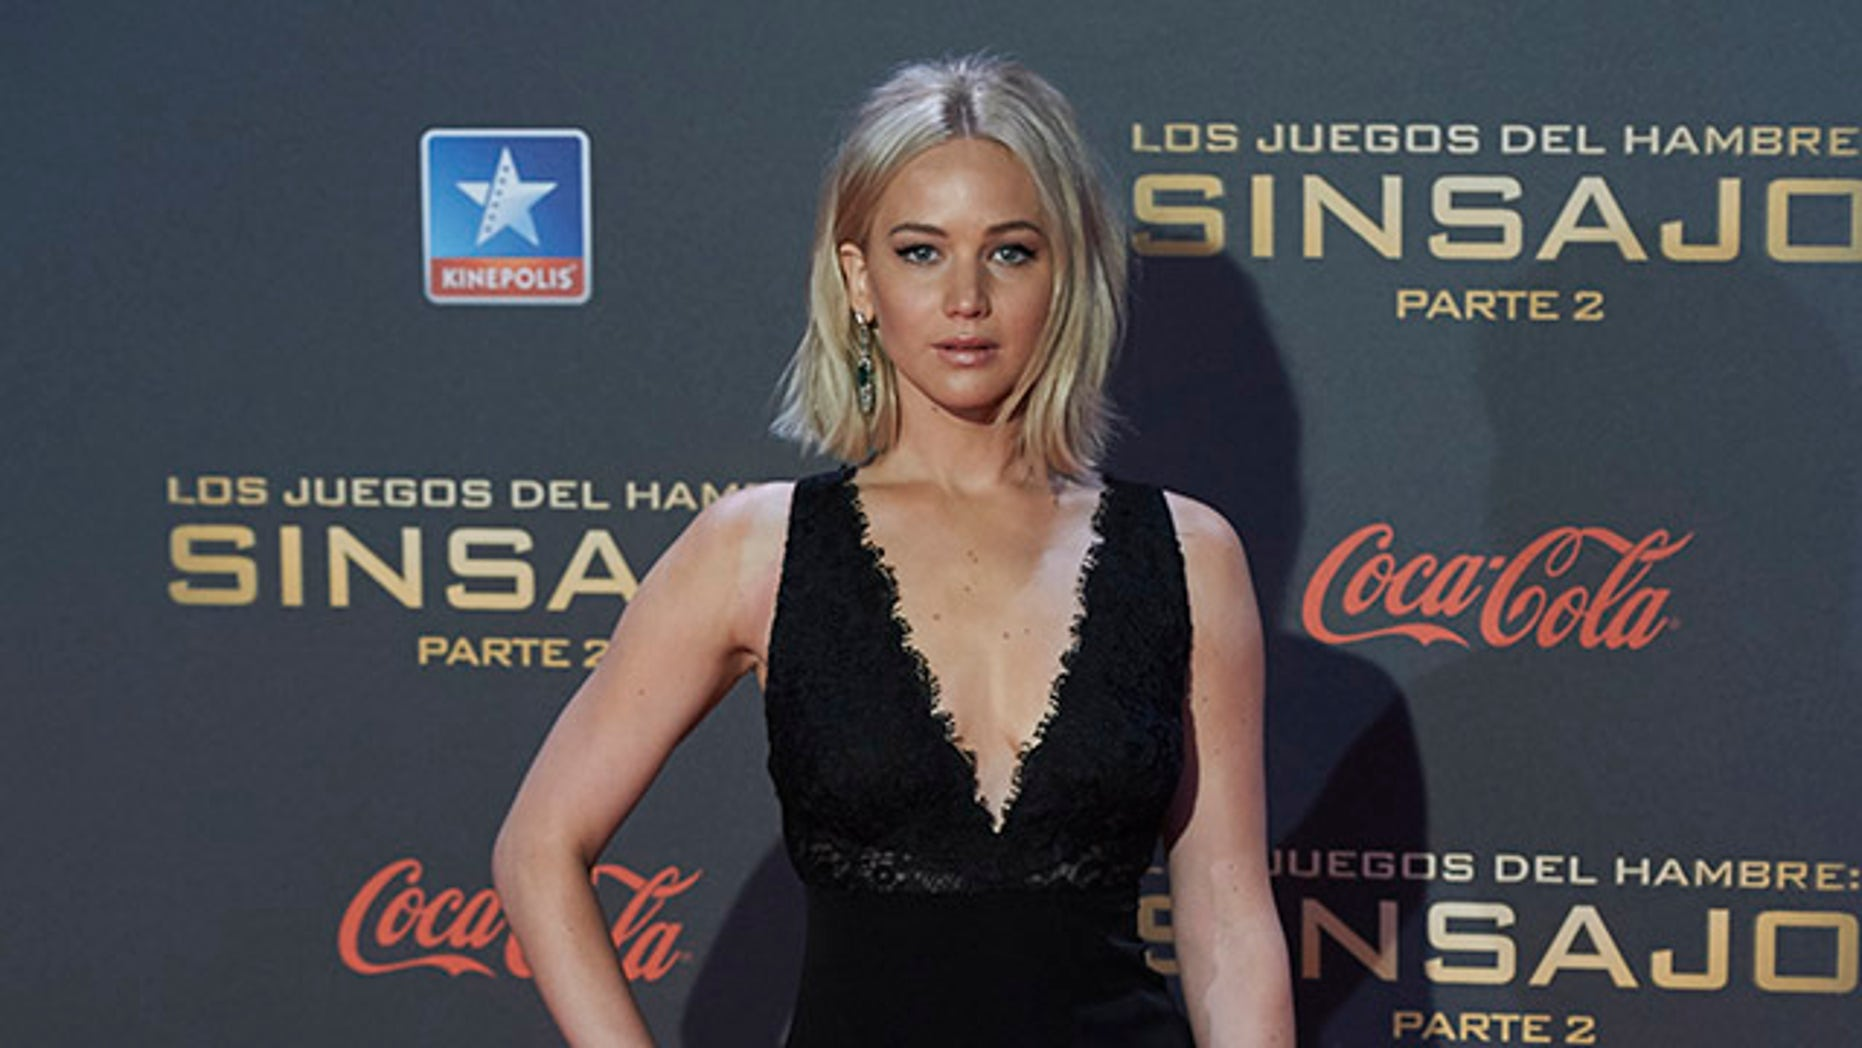 "MADRID, SPAIN - NOVEMBER 10:  Actress Jennifer Lawrence attends ""The Hunger Games: Mockingjay - Part 2"" (Los Juegos del Hambre: Sinsajo Parte 2) premiere at the Kinepolis Cinema on November 10, 2015 in Madrid, Spain.  (Photo by Carlos Alvarez/Getty Images)"